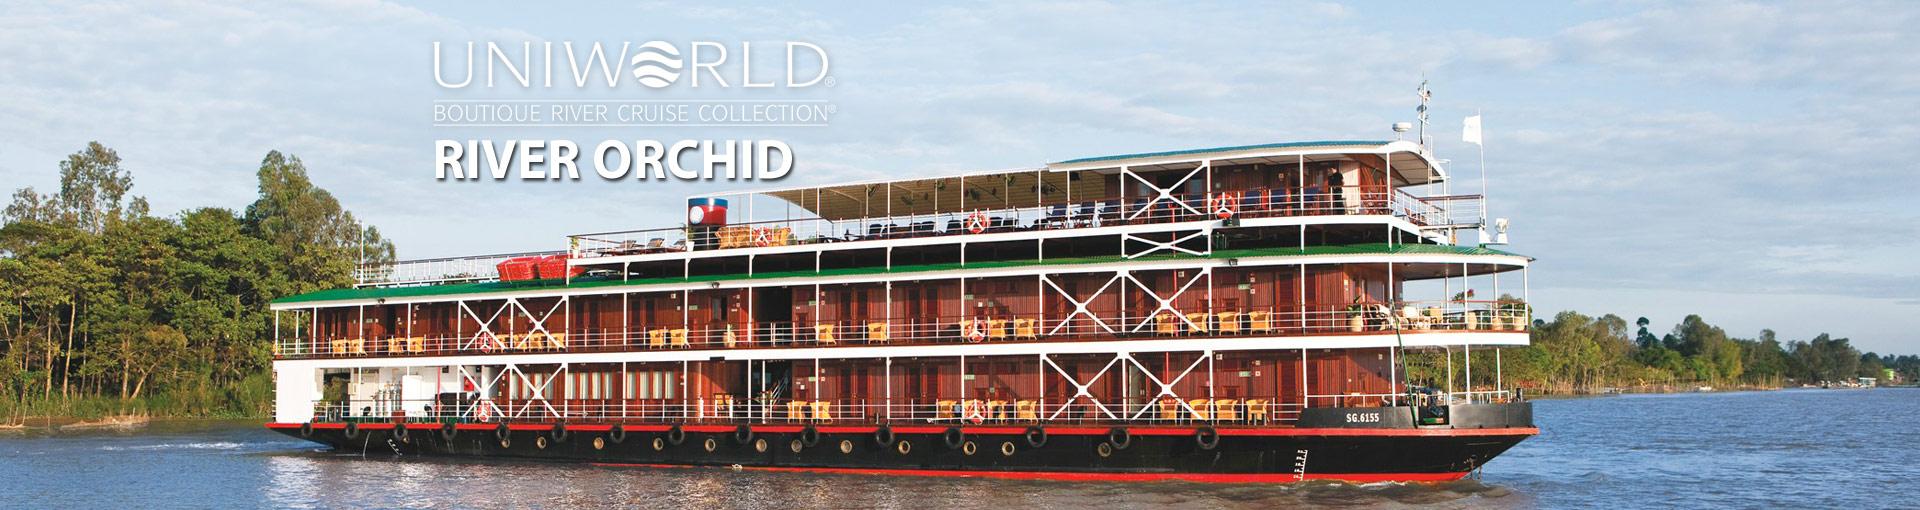 Uniworld River Cruises River Orchid river ship